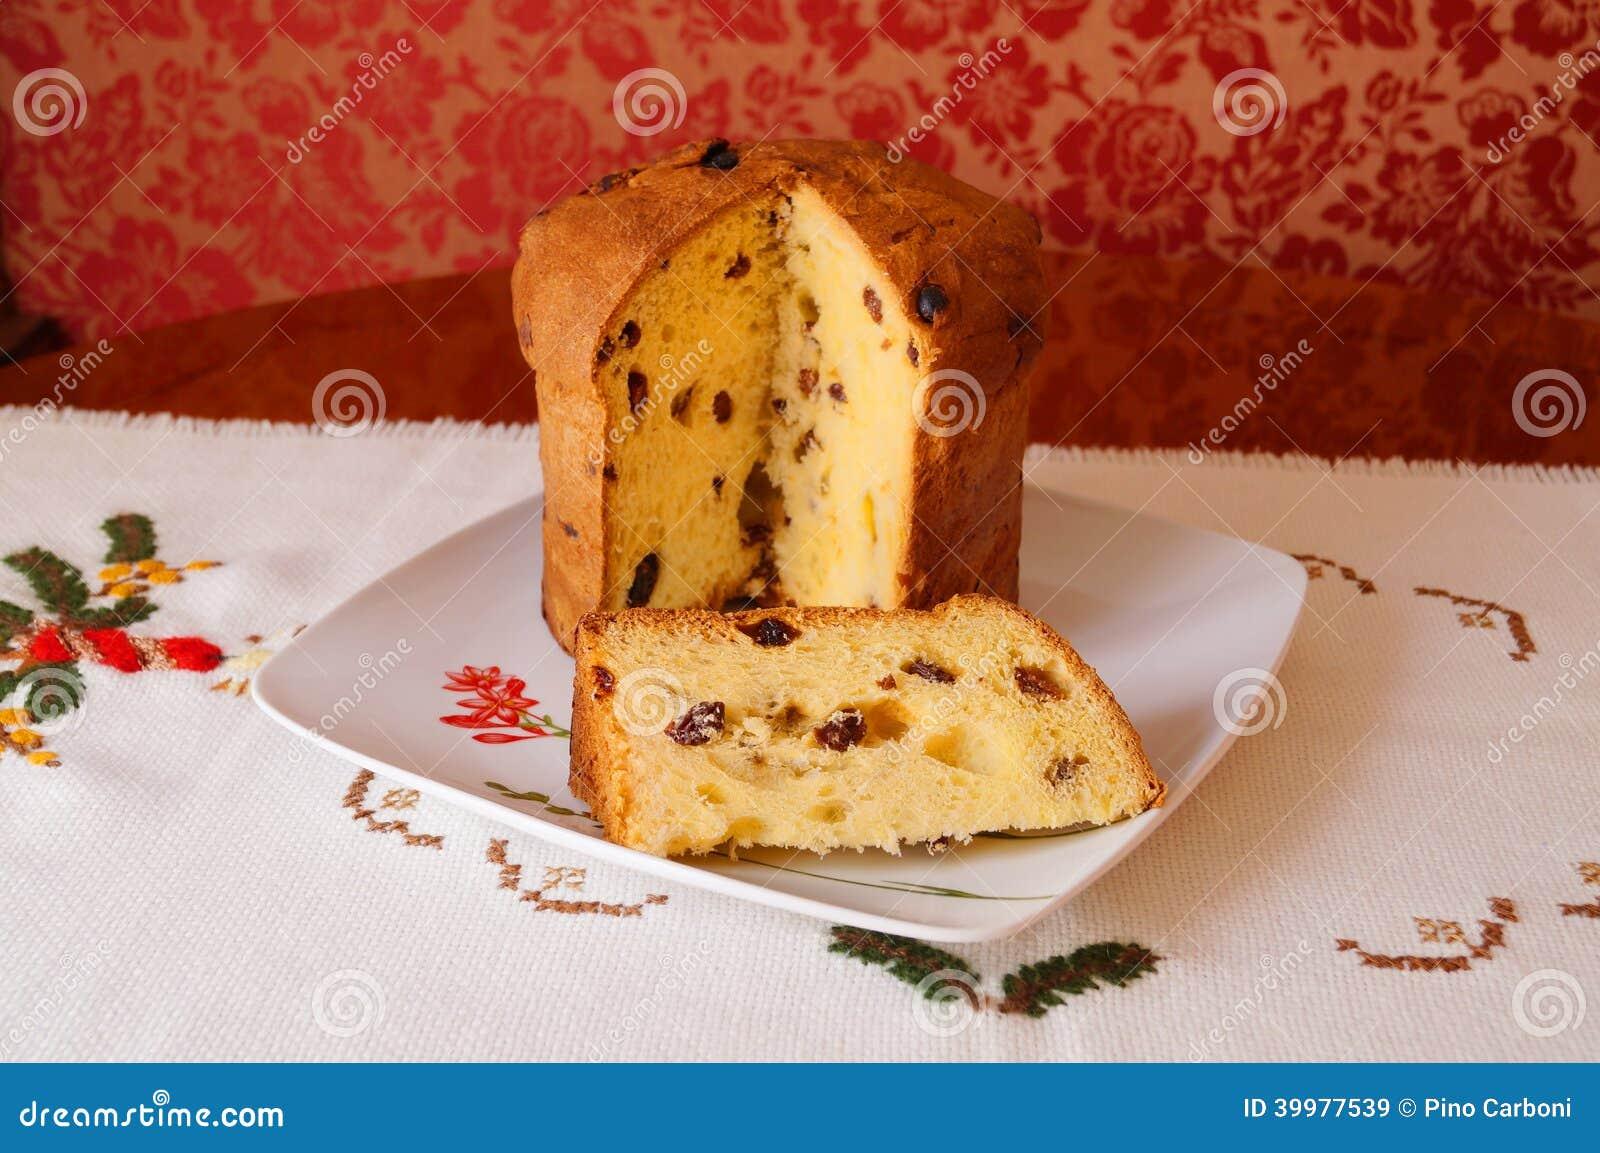 Italian Fruit Cake Recipes: Christmas Italian Fruit-cake Panettone Partially S Stock